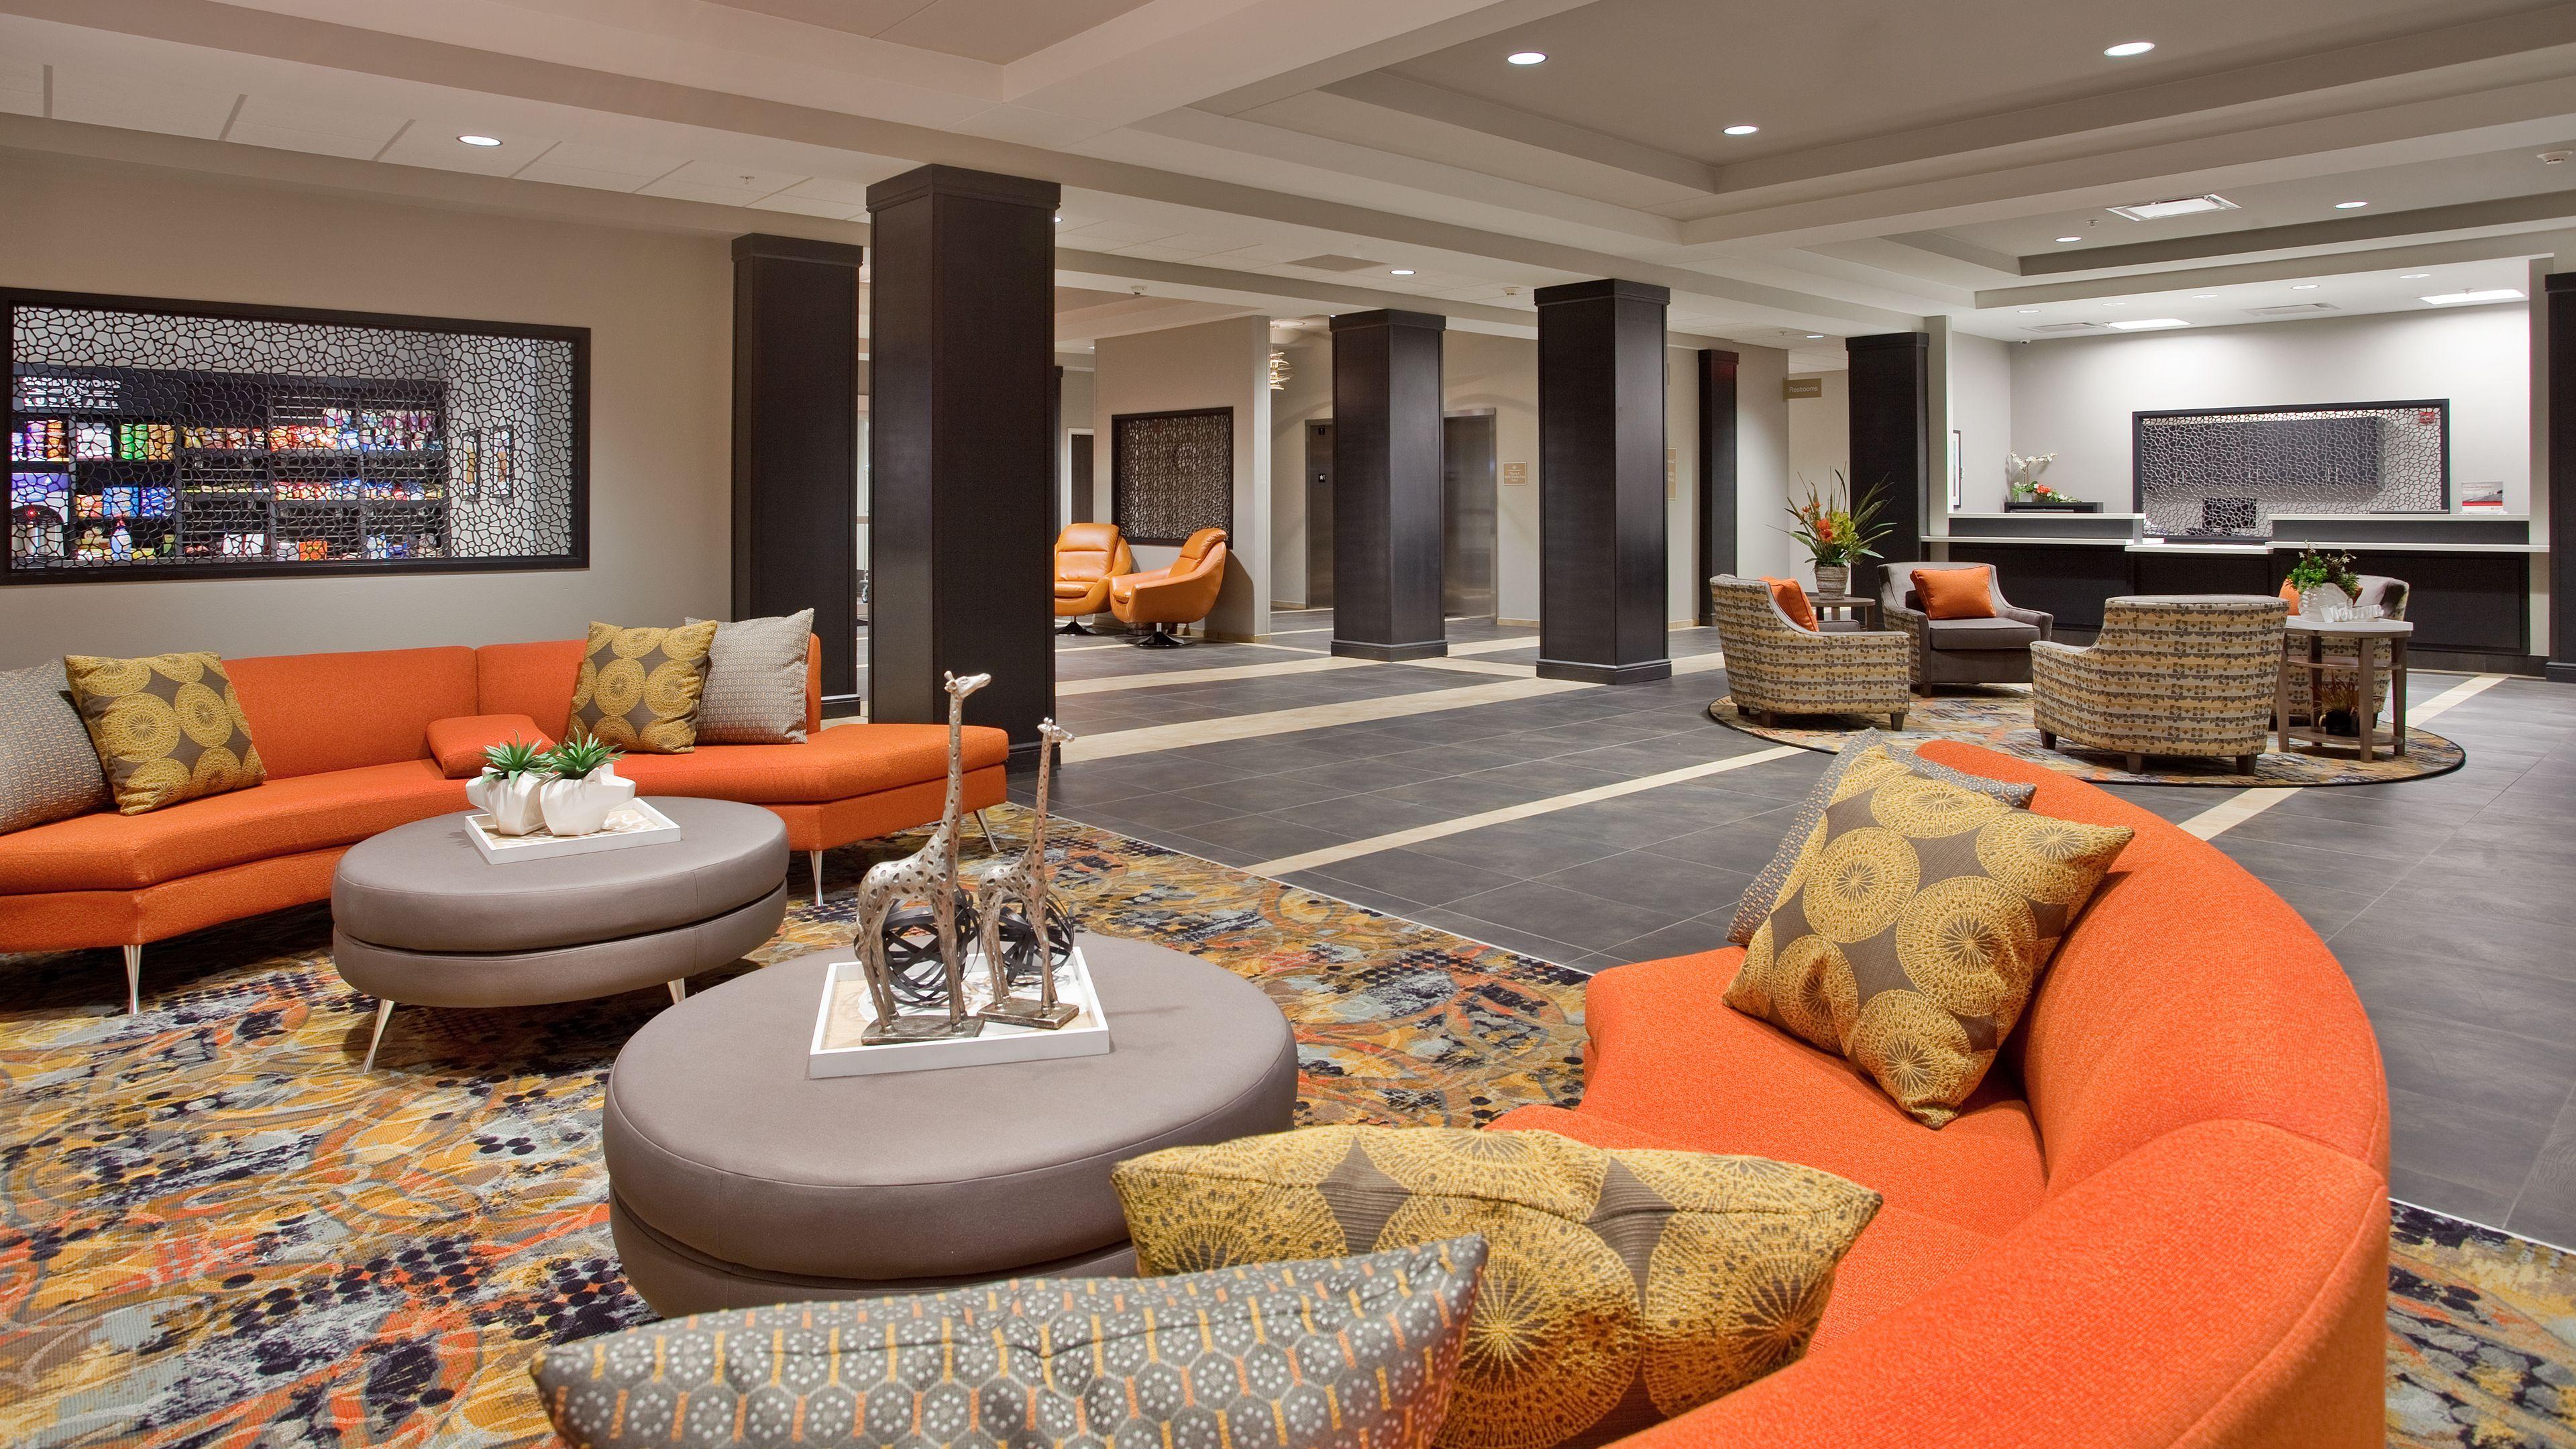 Candlewood Suites Kearney image 4